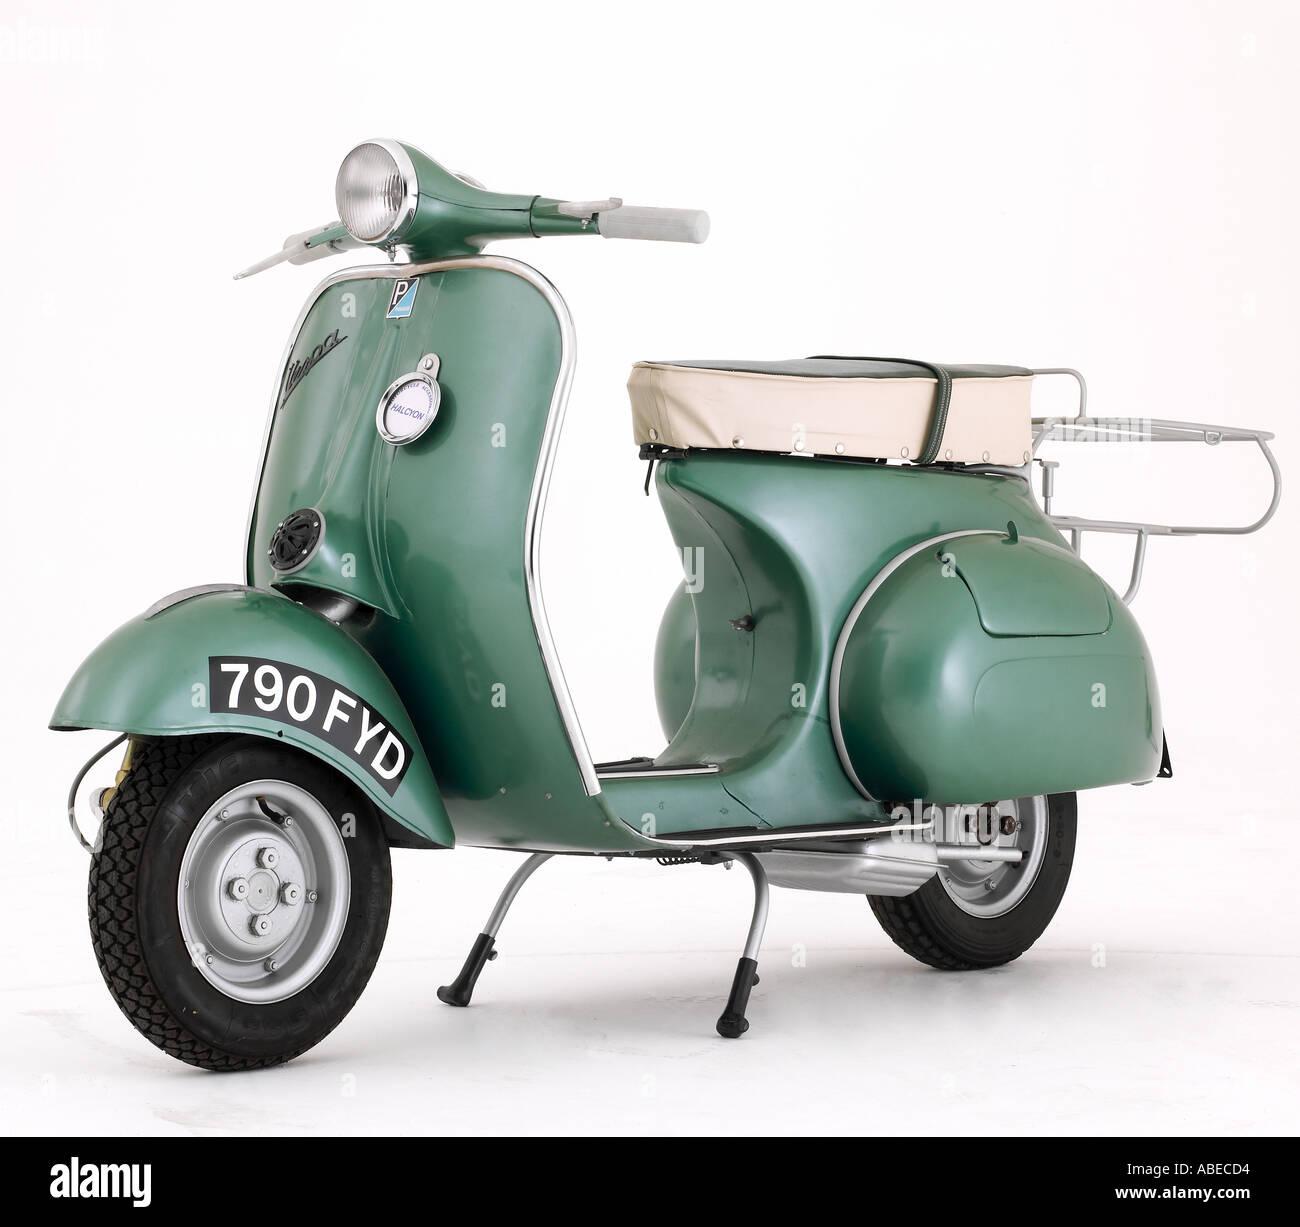 image gallery 1950 vespa scooters. Black Bedroom Furniture Sets. Home Design Ideas